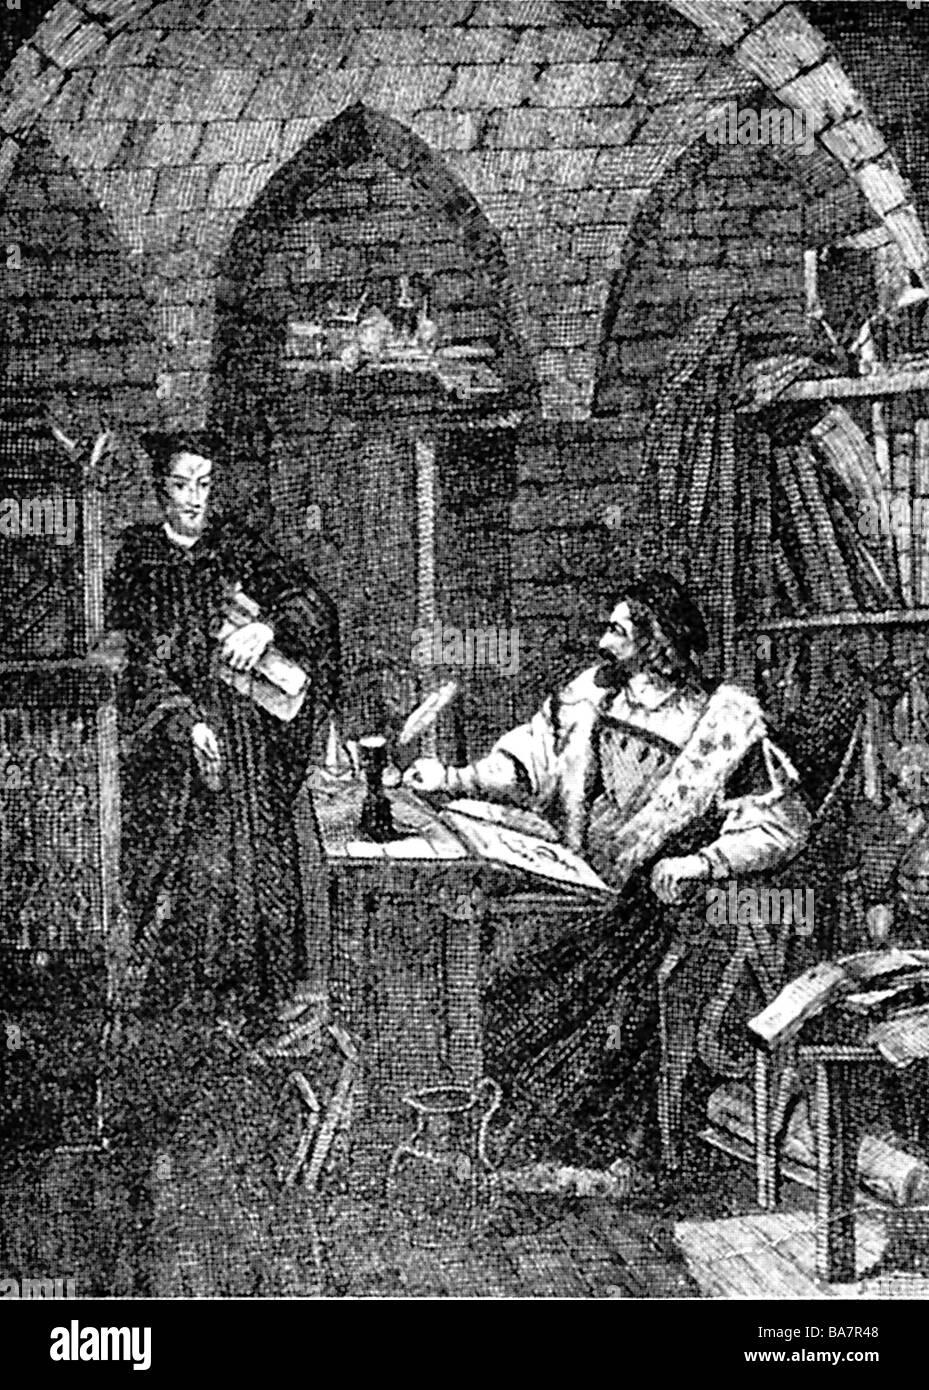 Faust, Johann Georg, 1480 - 1540, German magician